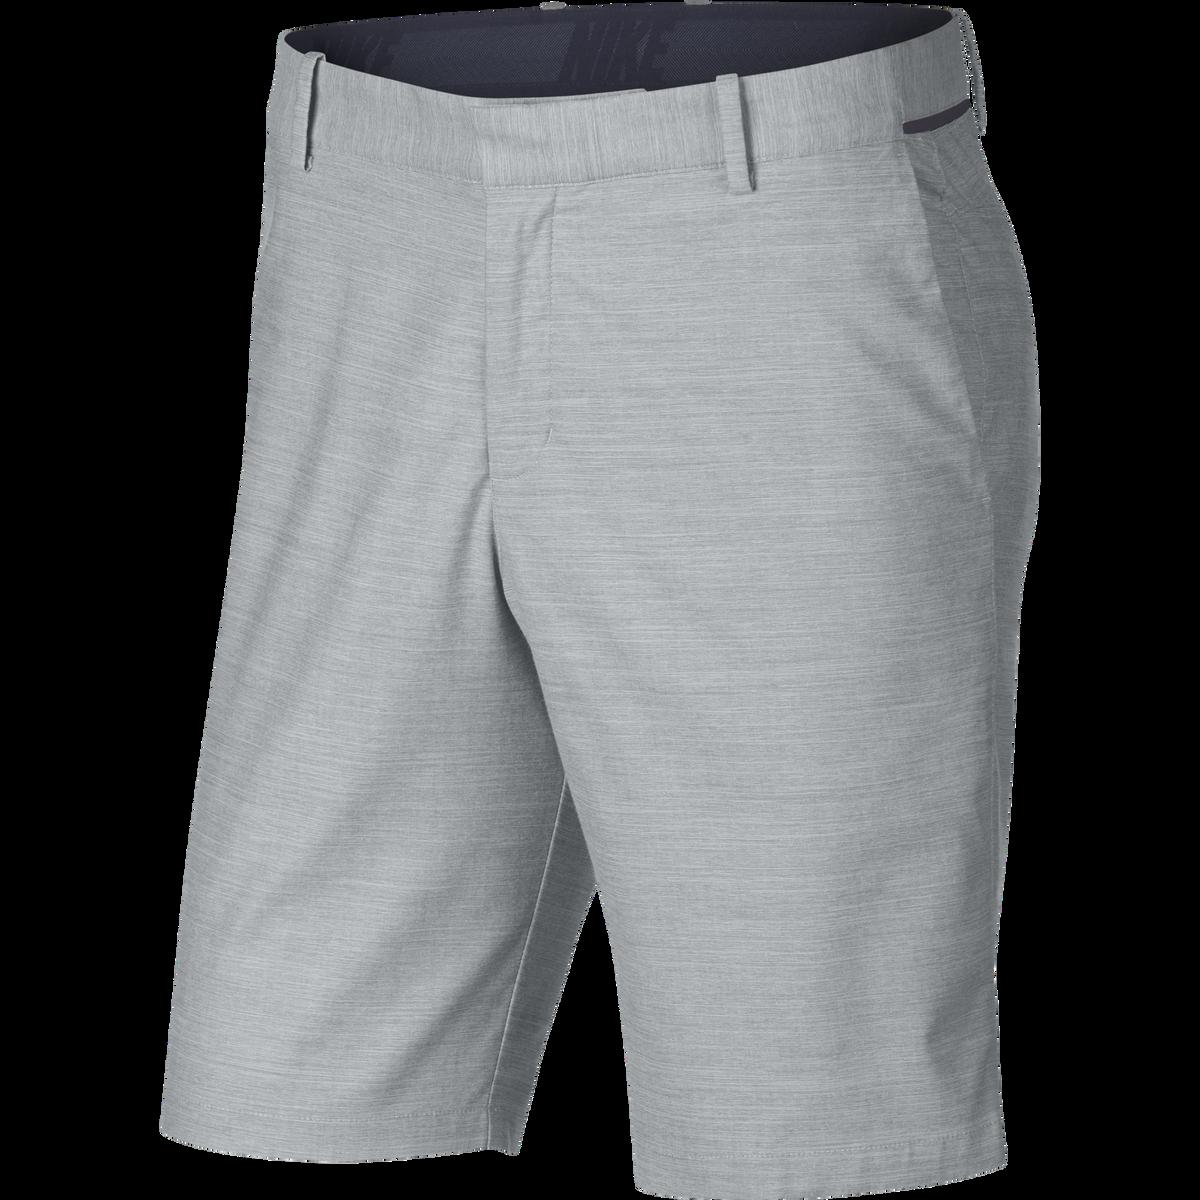 658ed3b873865 Images. Nike Flex Golf Short